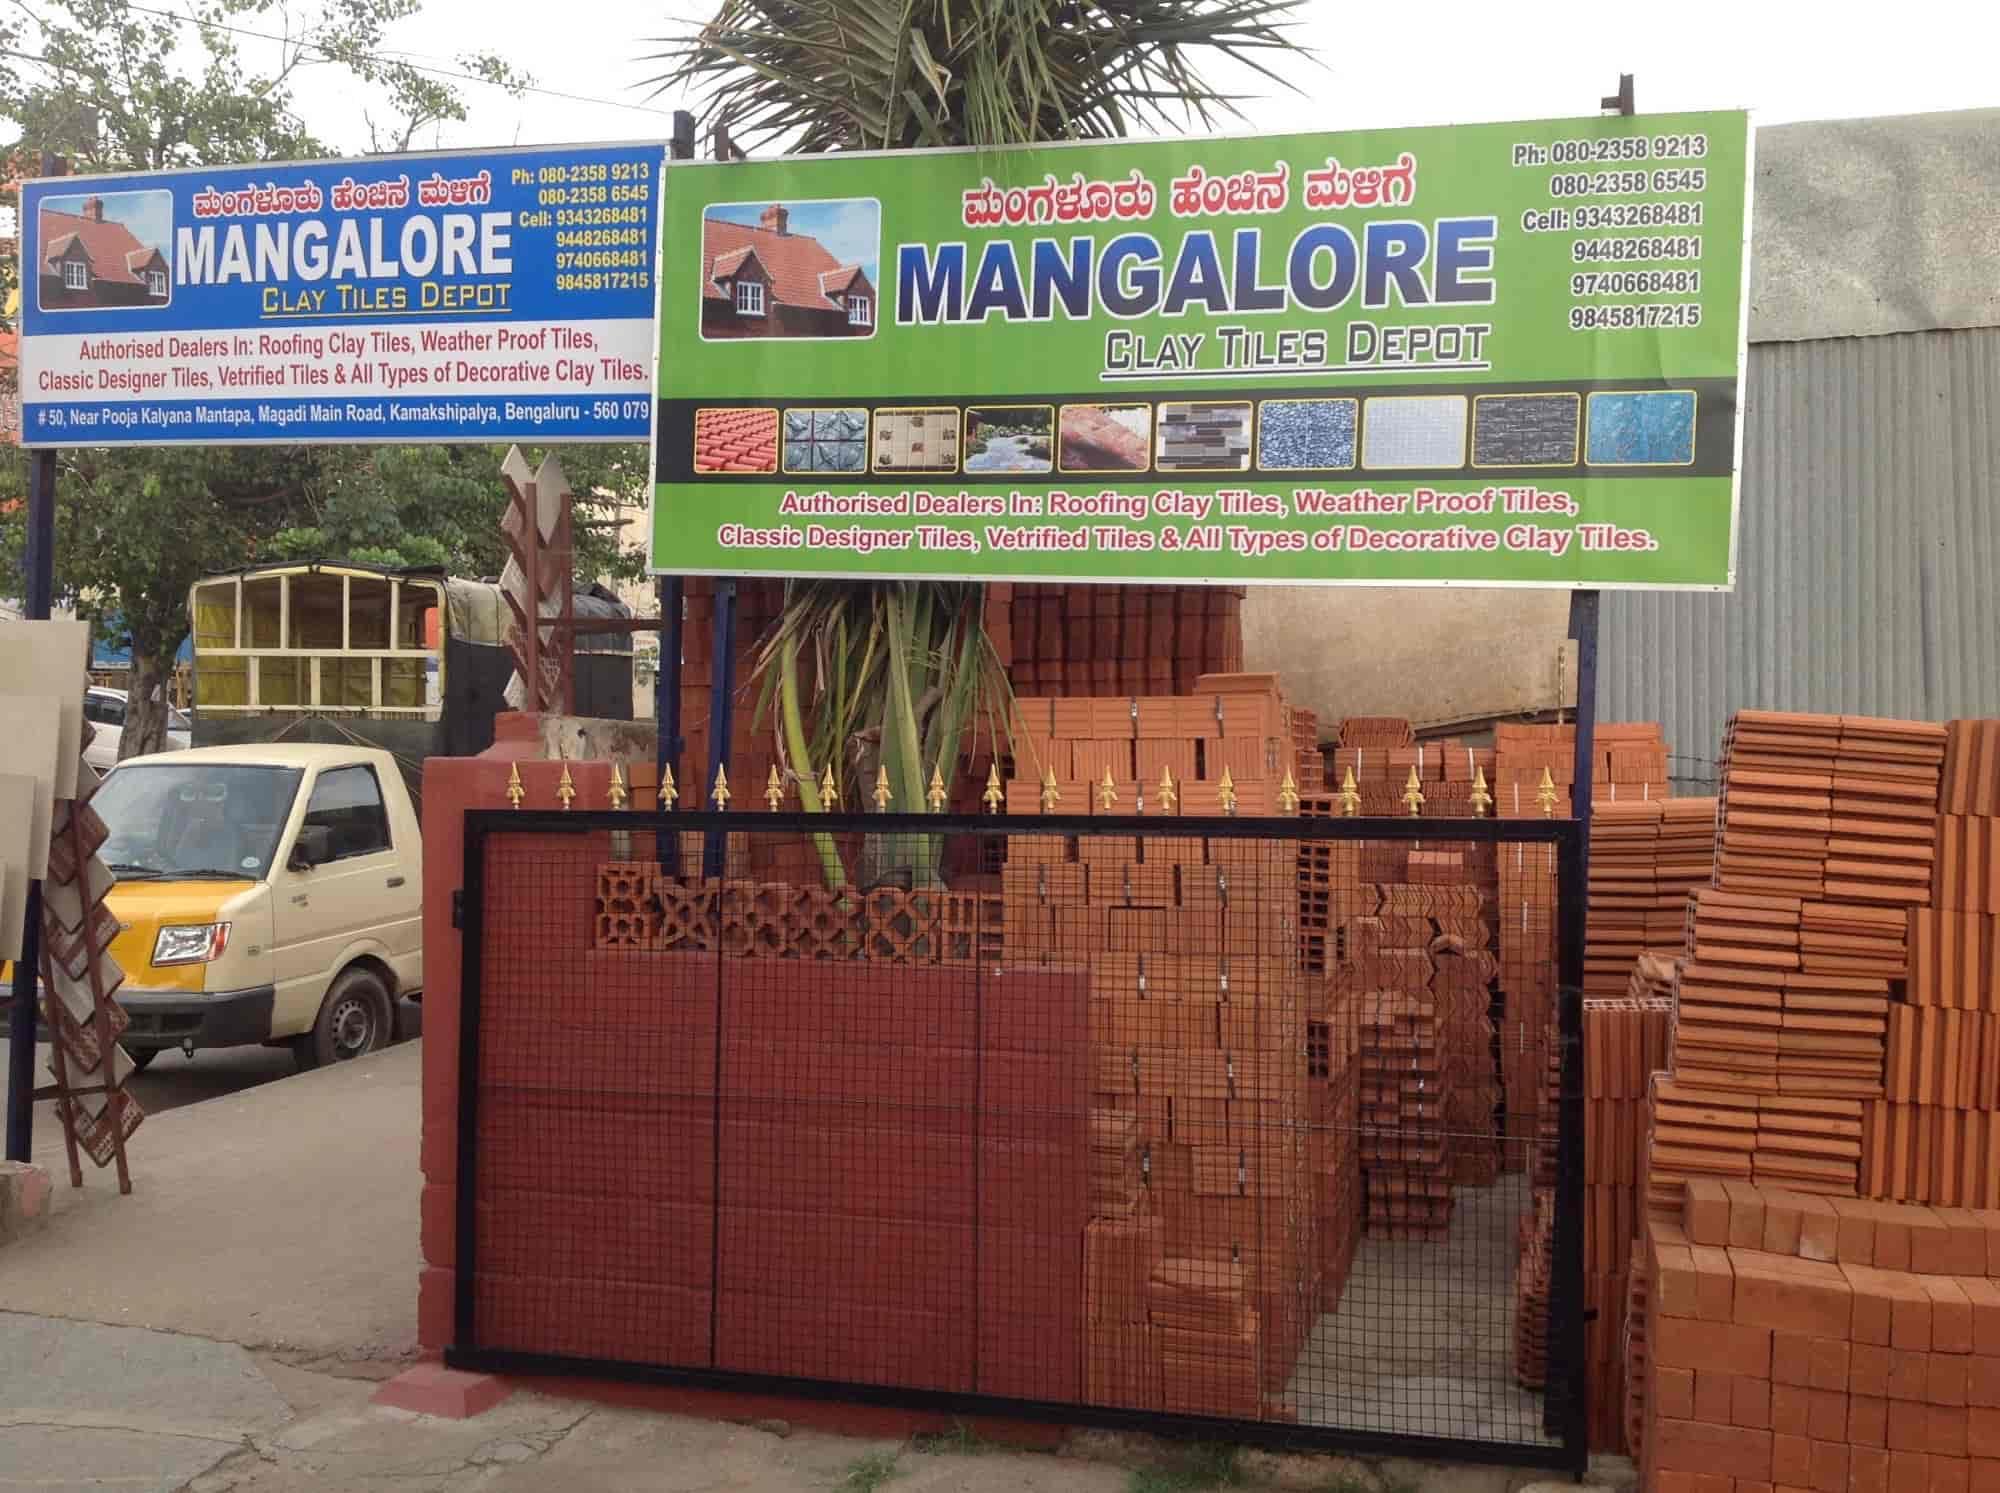 Mangalore Clay Tiles Depot, Kamakshipalya - Tile Dealers in ...